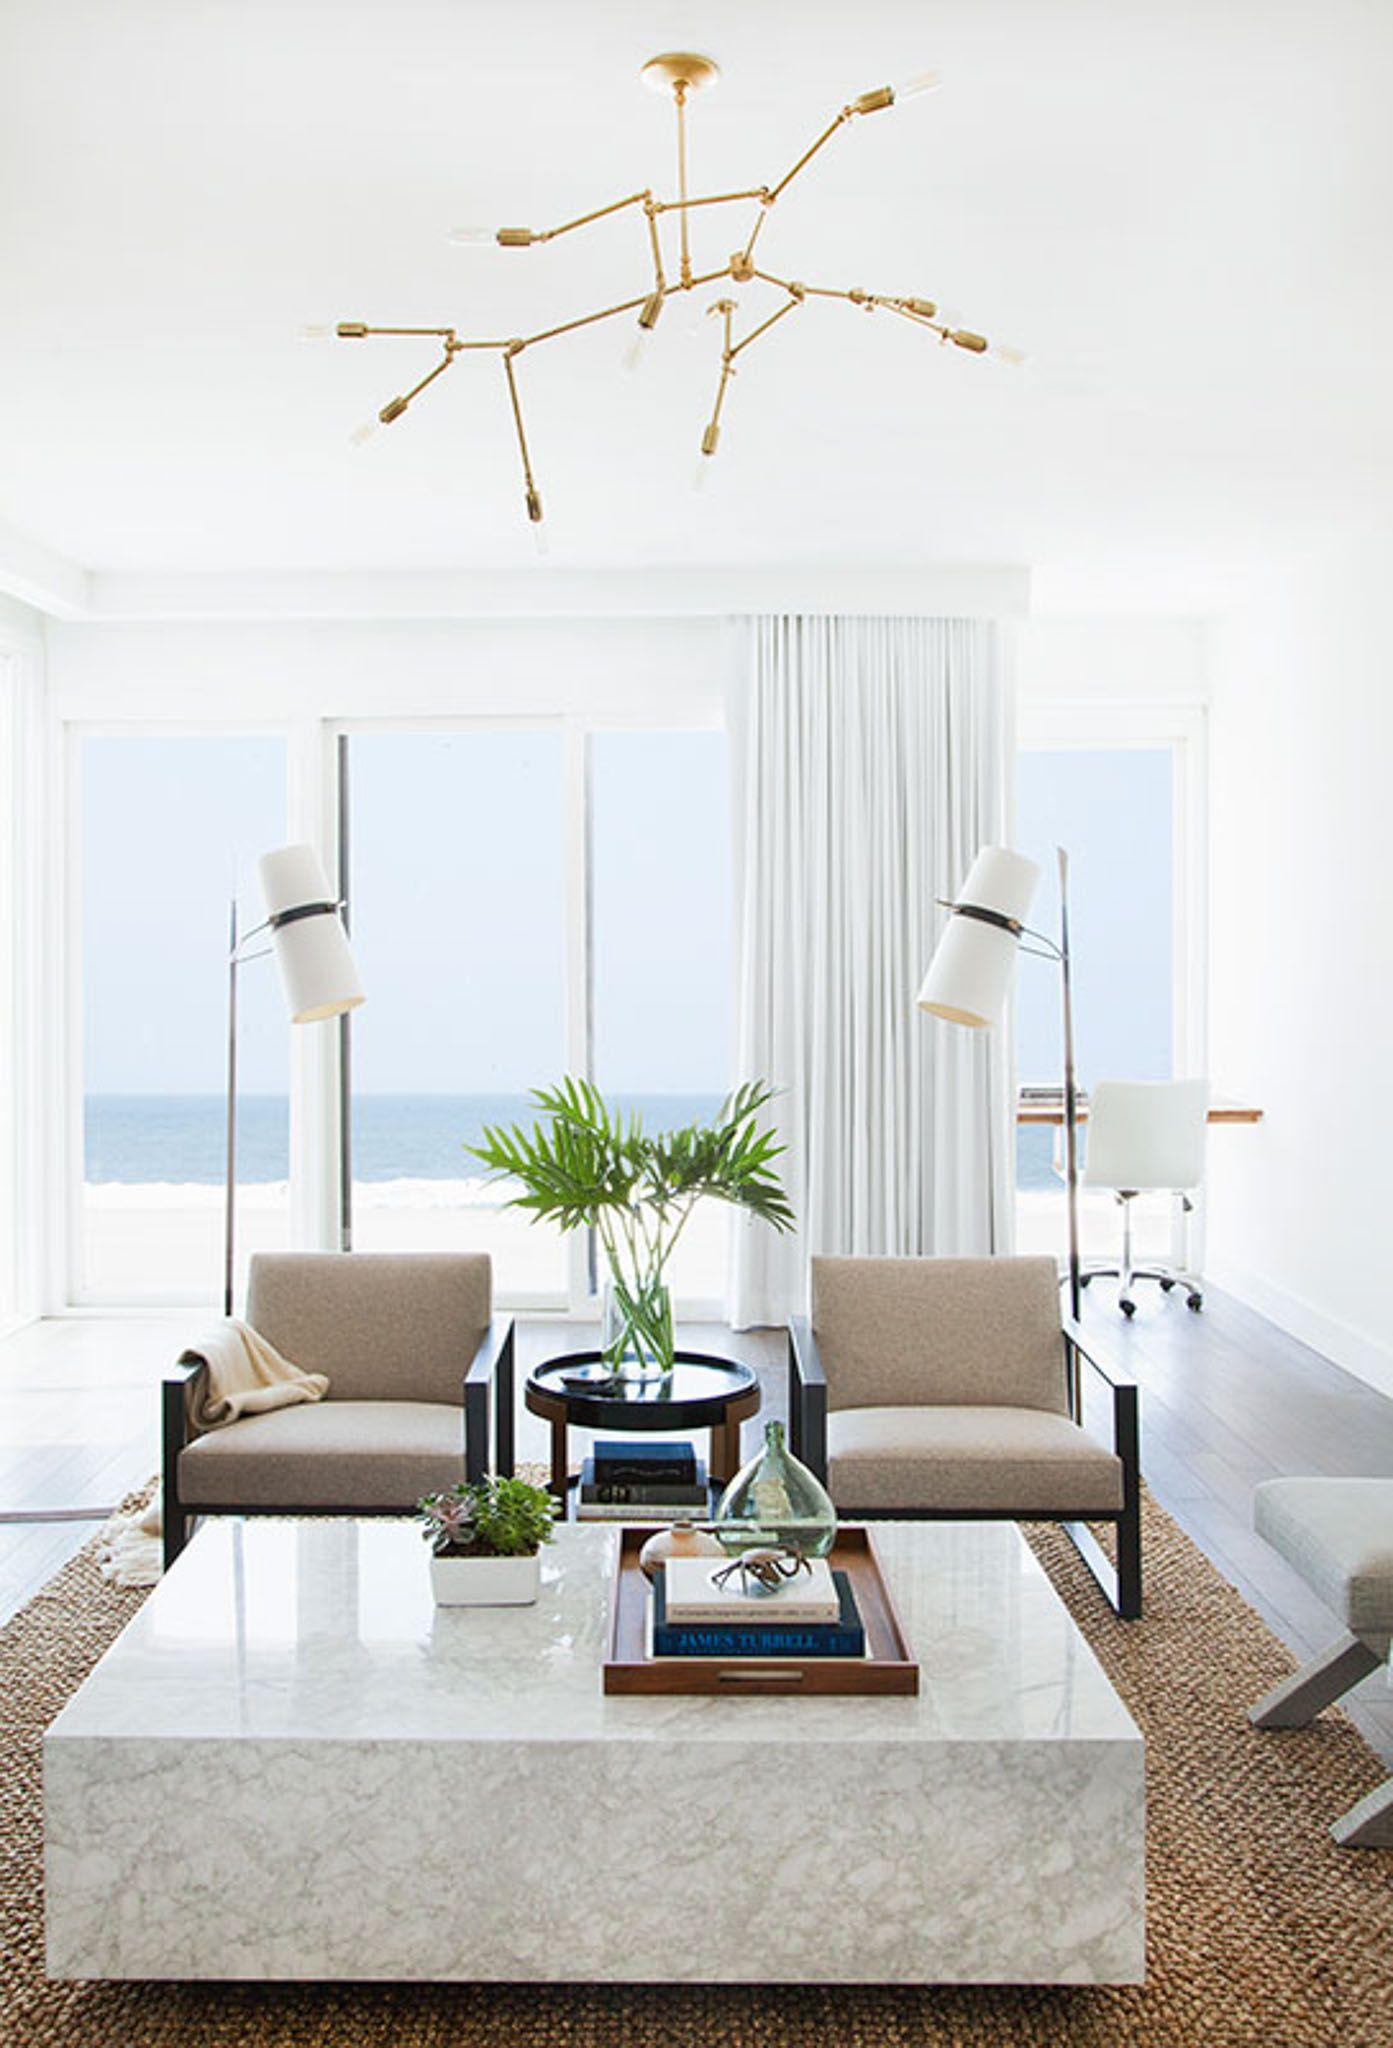 Minimalist Modern Beach House Design White Walls And Curtains